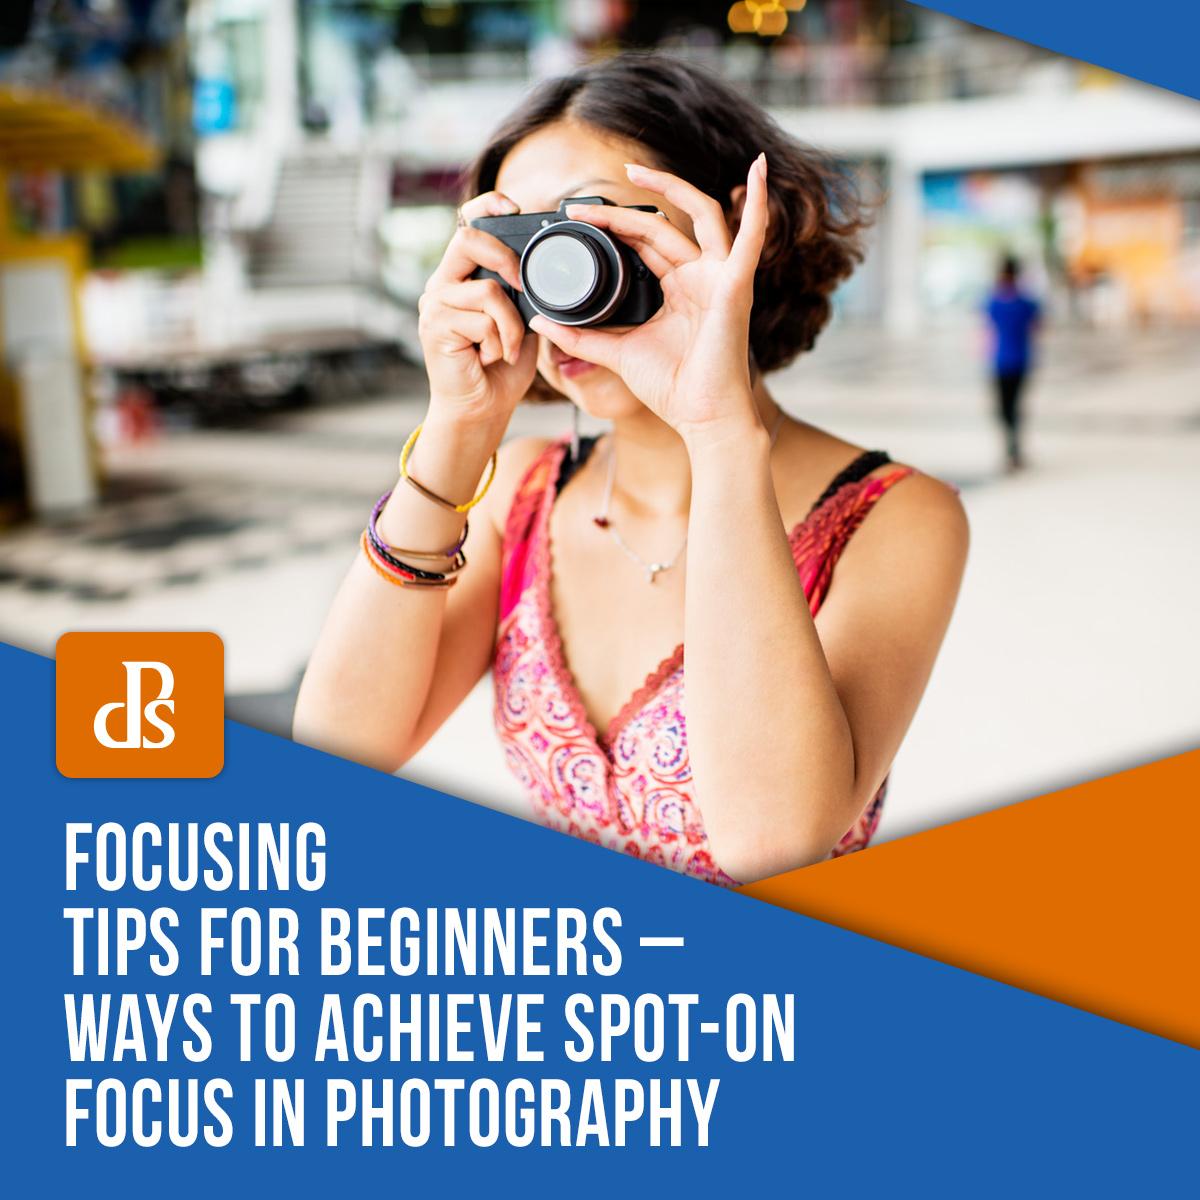 focusing-tips-for-beginners